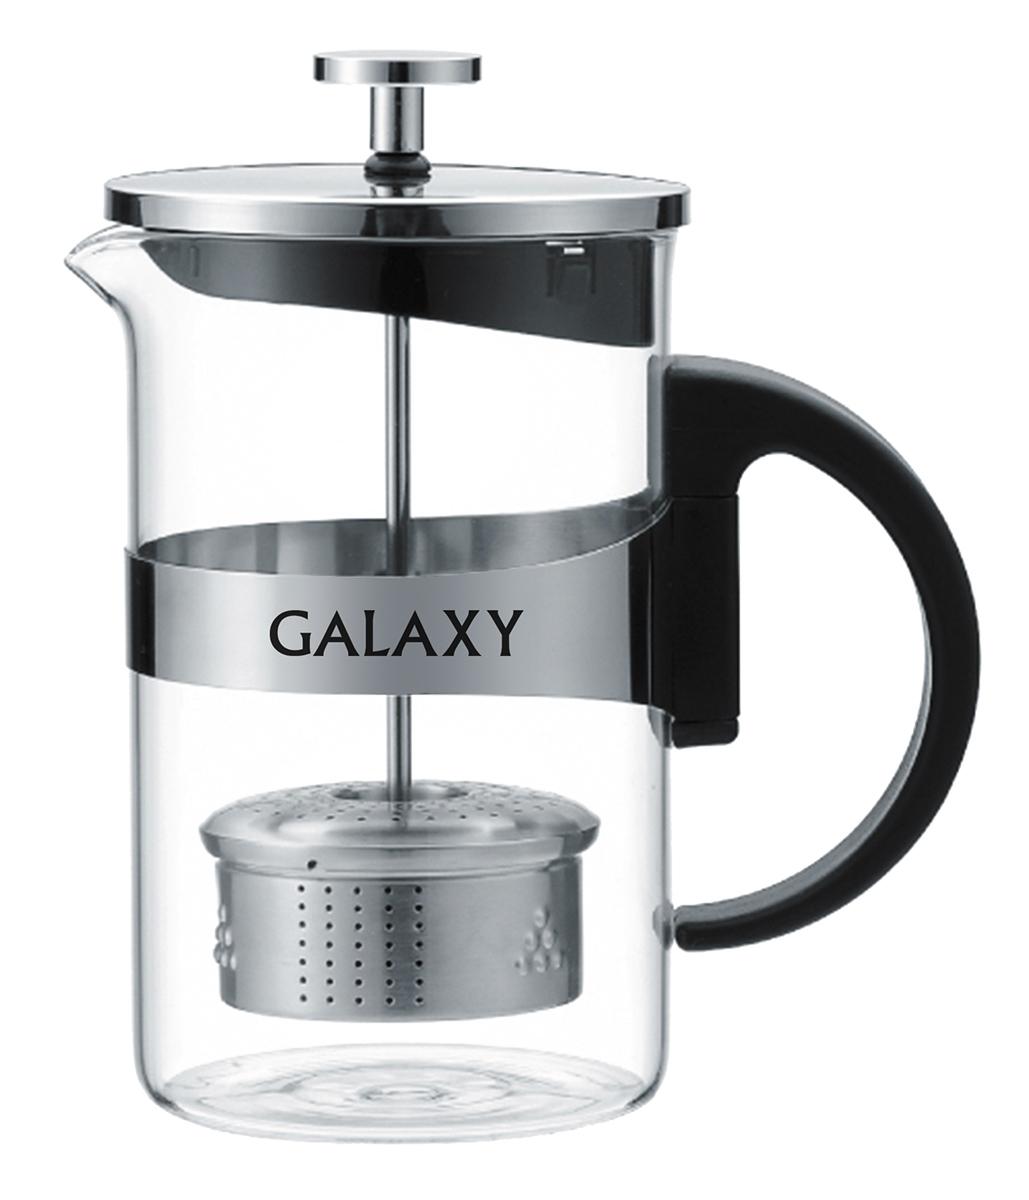 Френч-пресс Galaxy, 600 мл. GL9303 френч пресс galaxy 600 мл gl9306